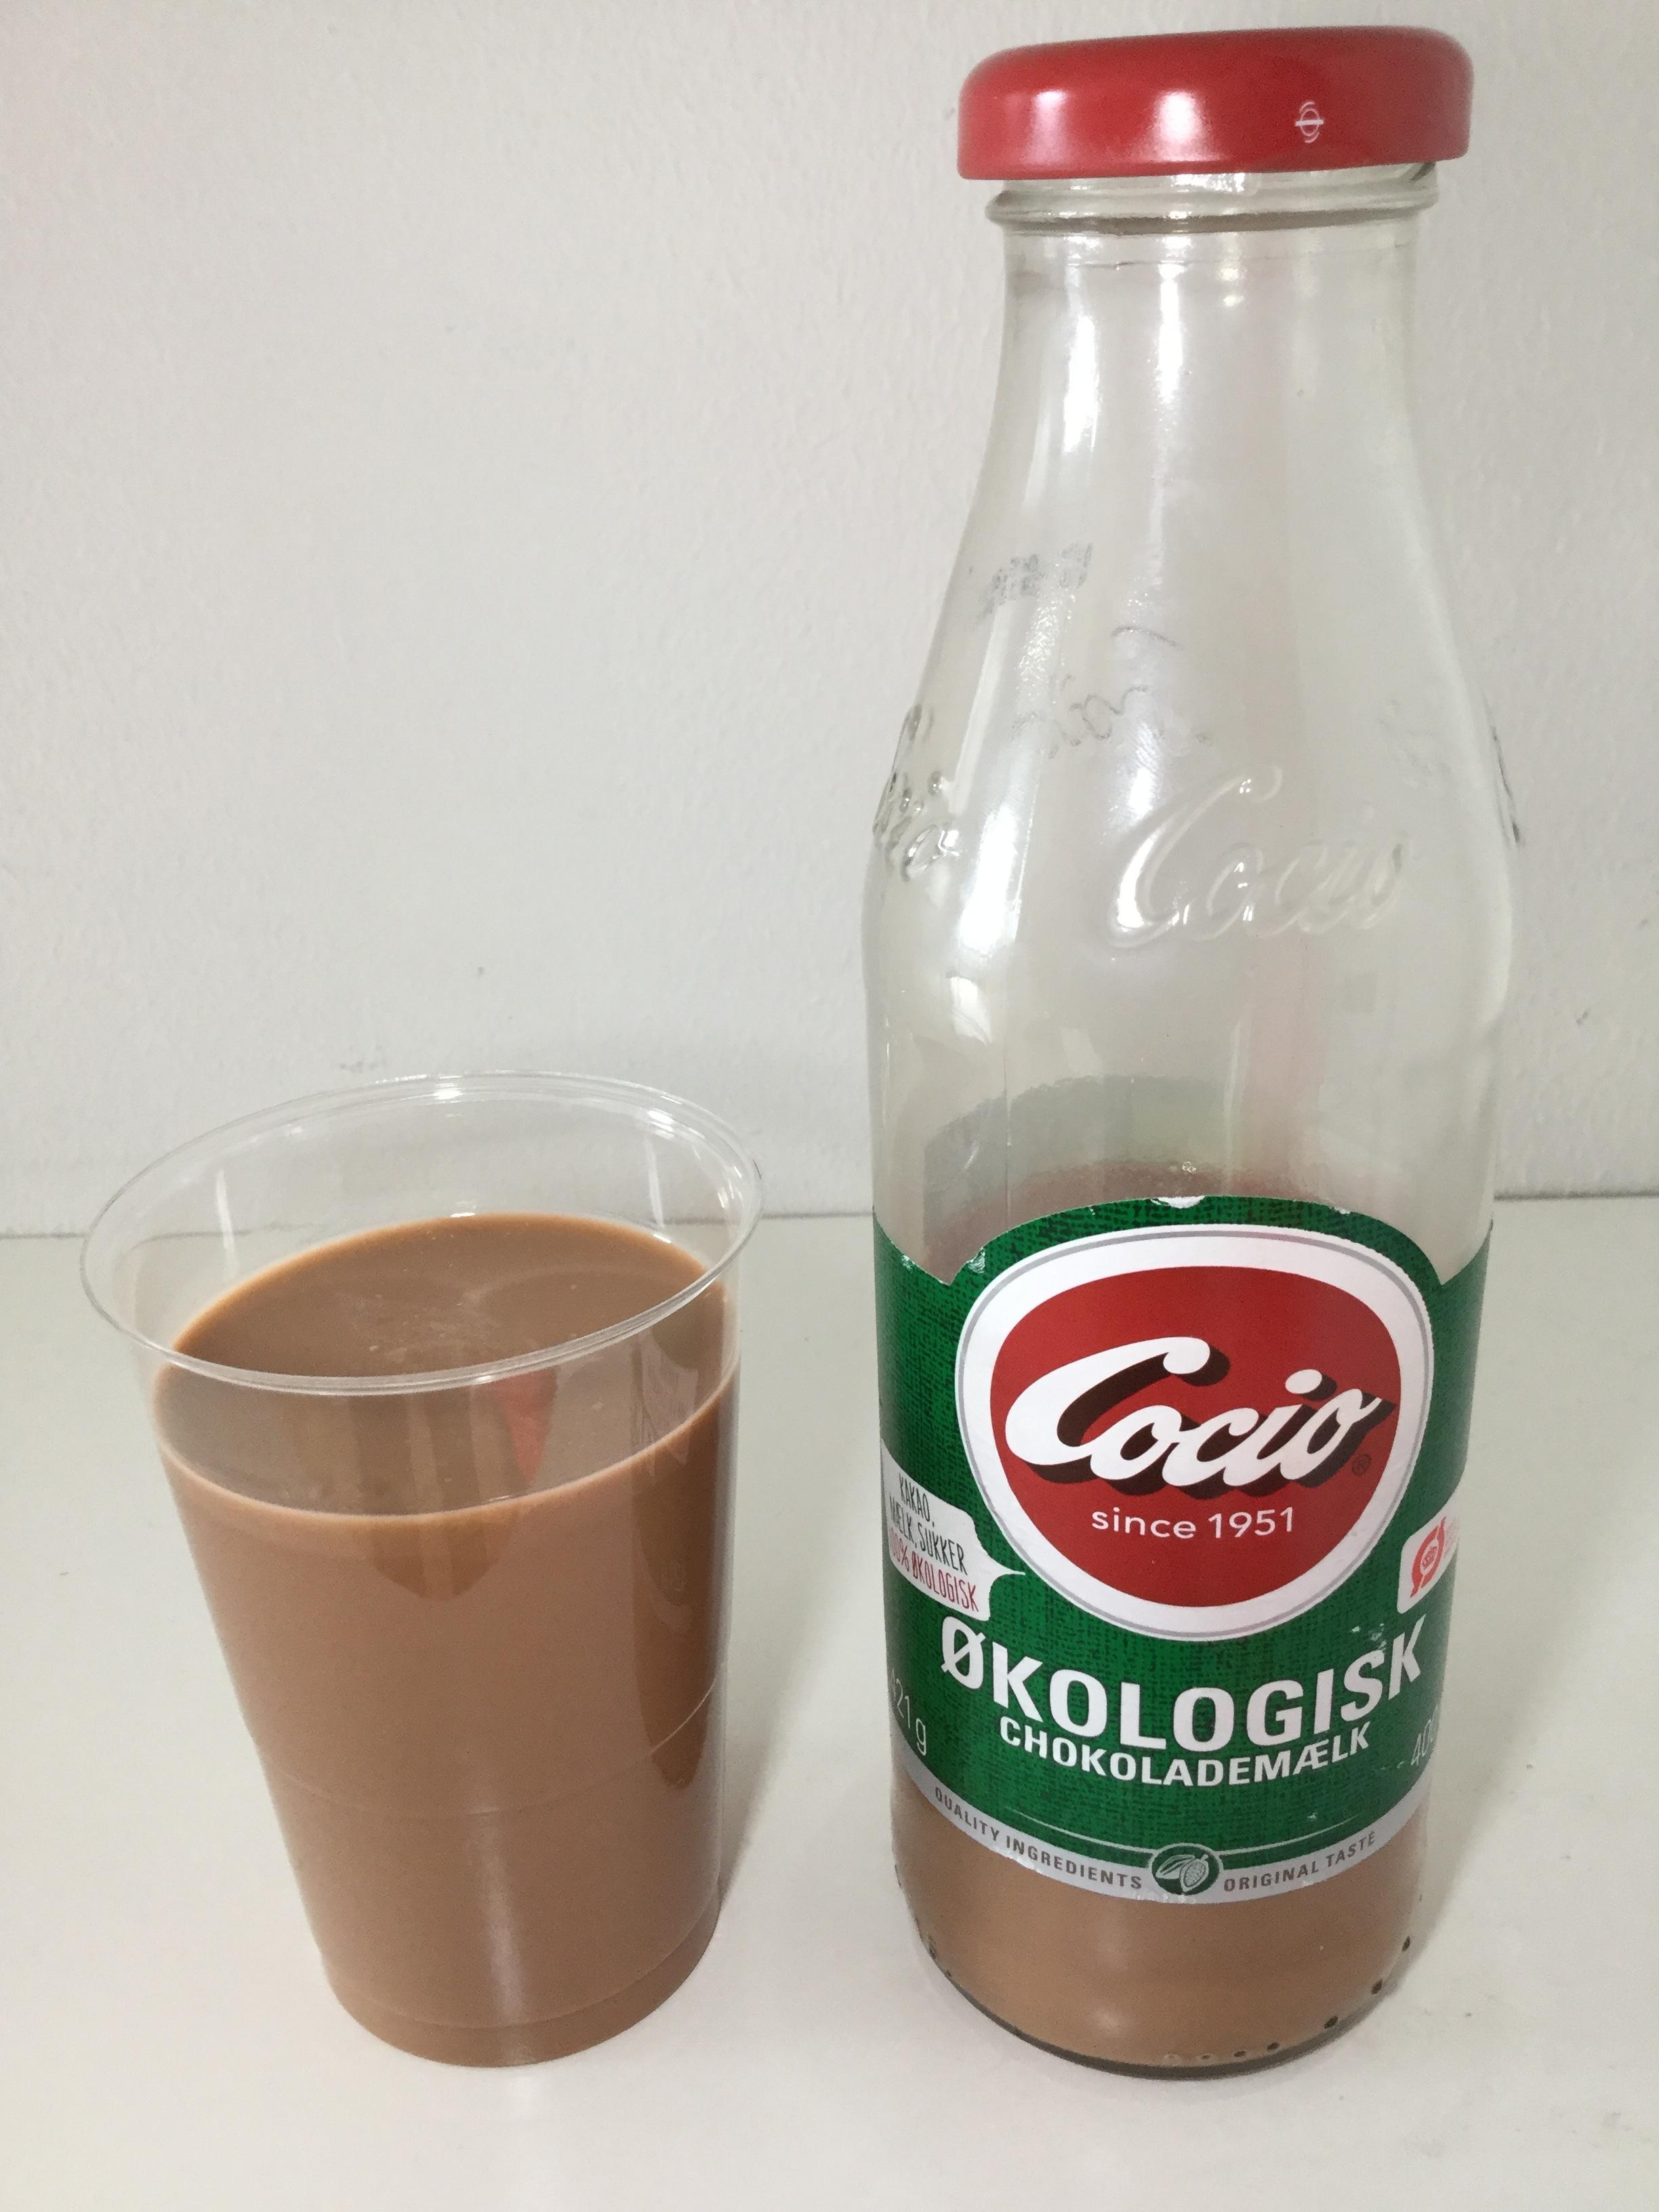 Cocio Okologisk Chocolademaelk Cup